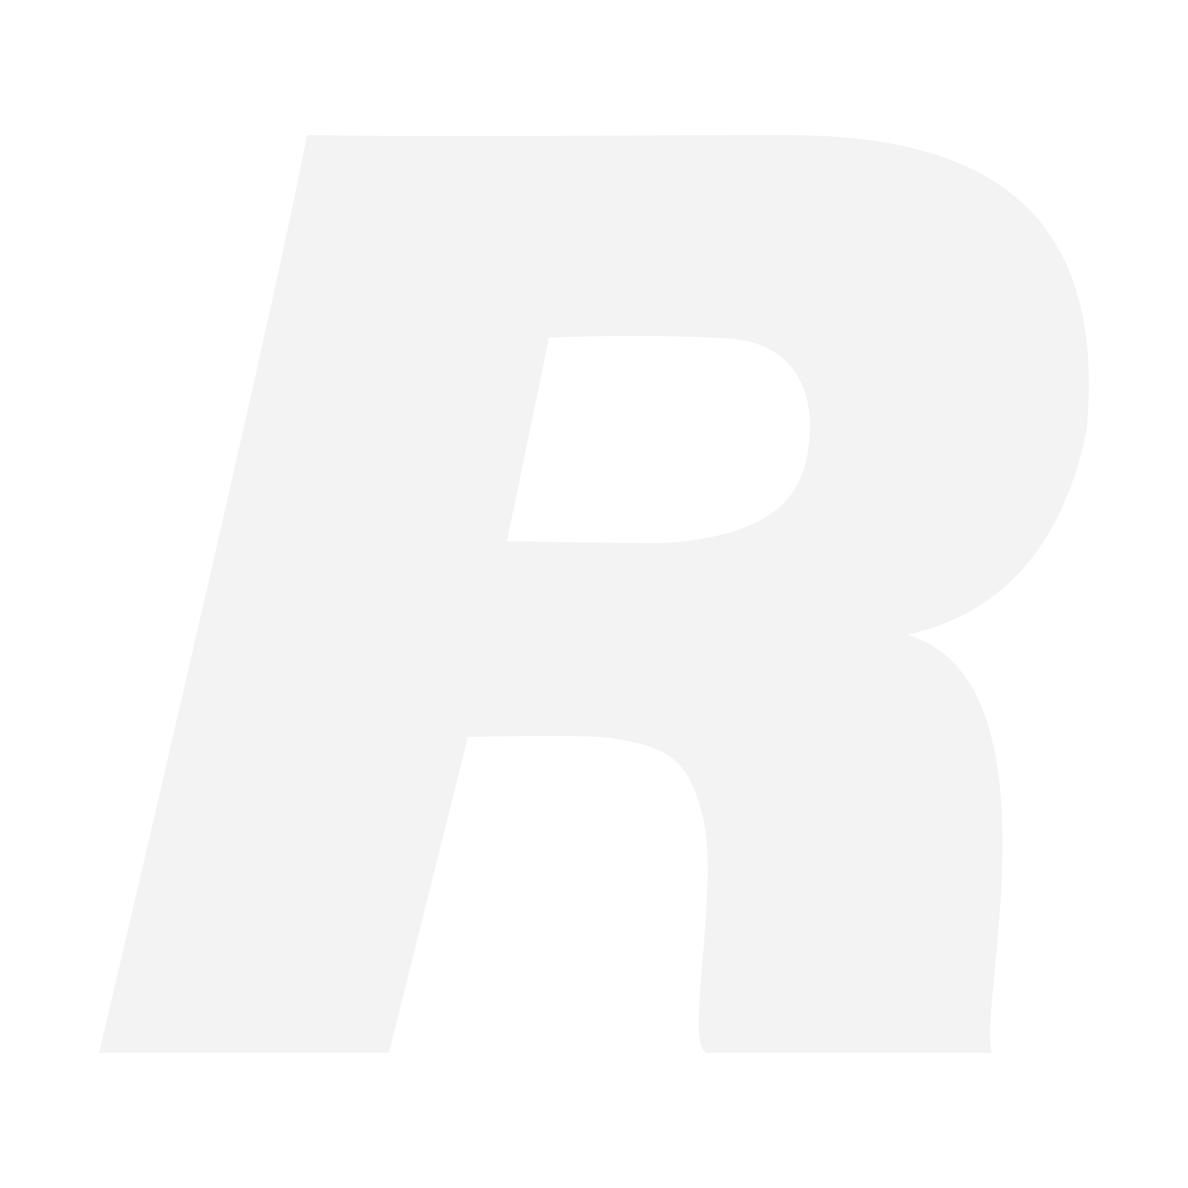 NIKON Type E Focusing Screen (D3)